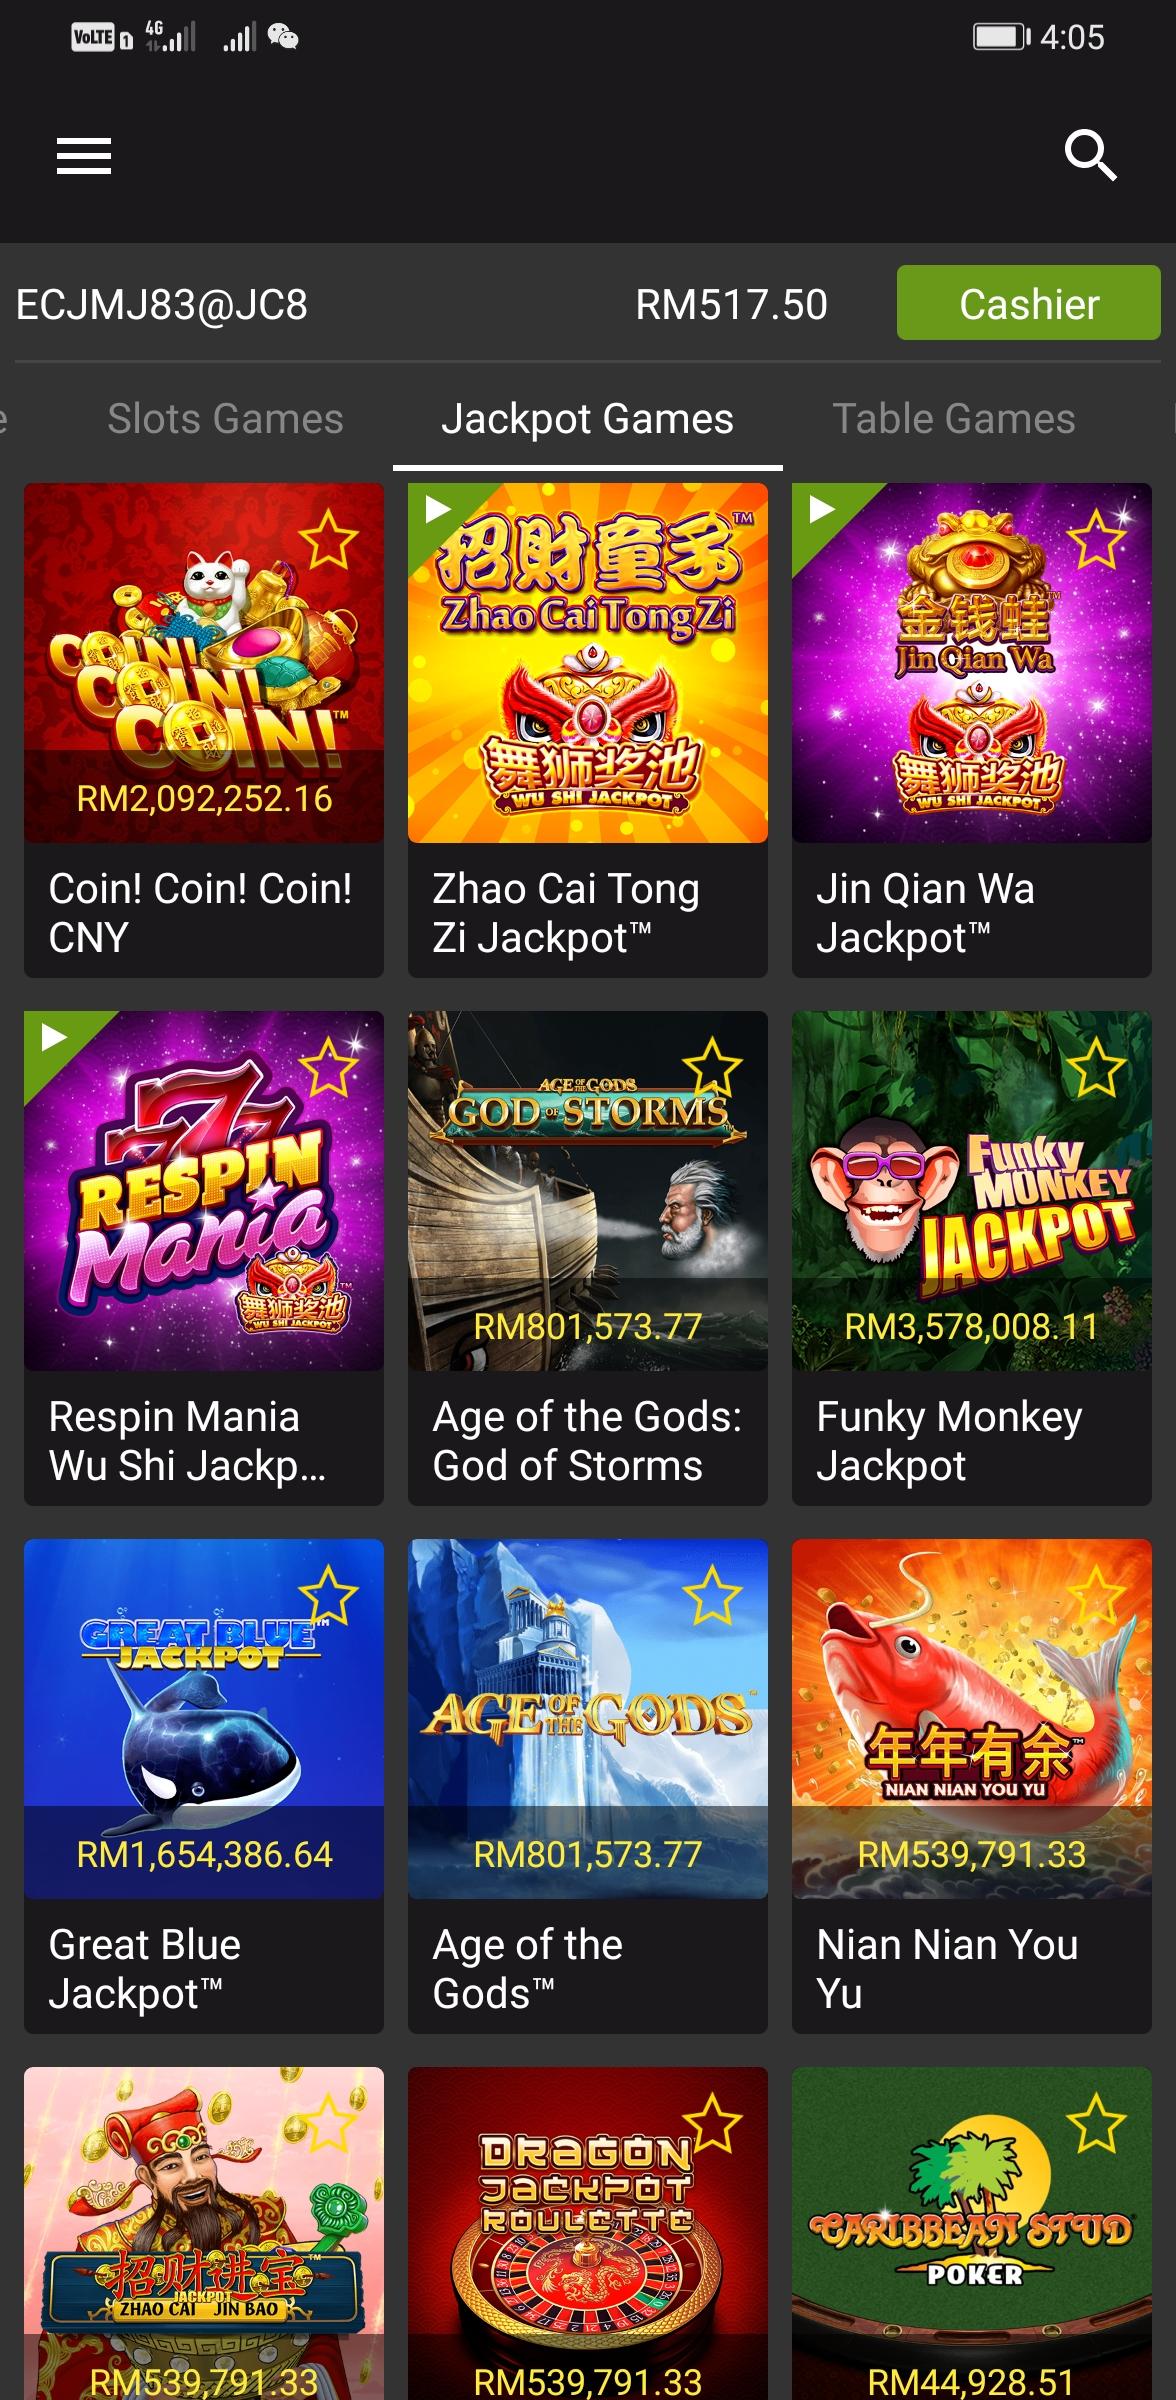 Chumash casino $100 free play